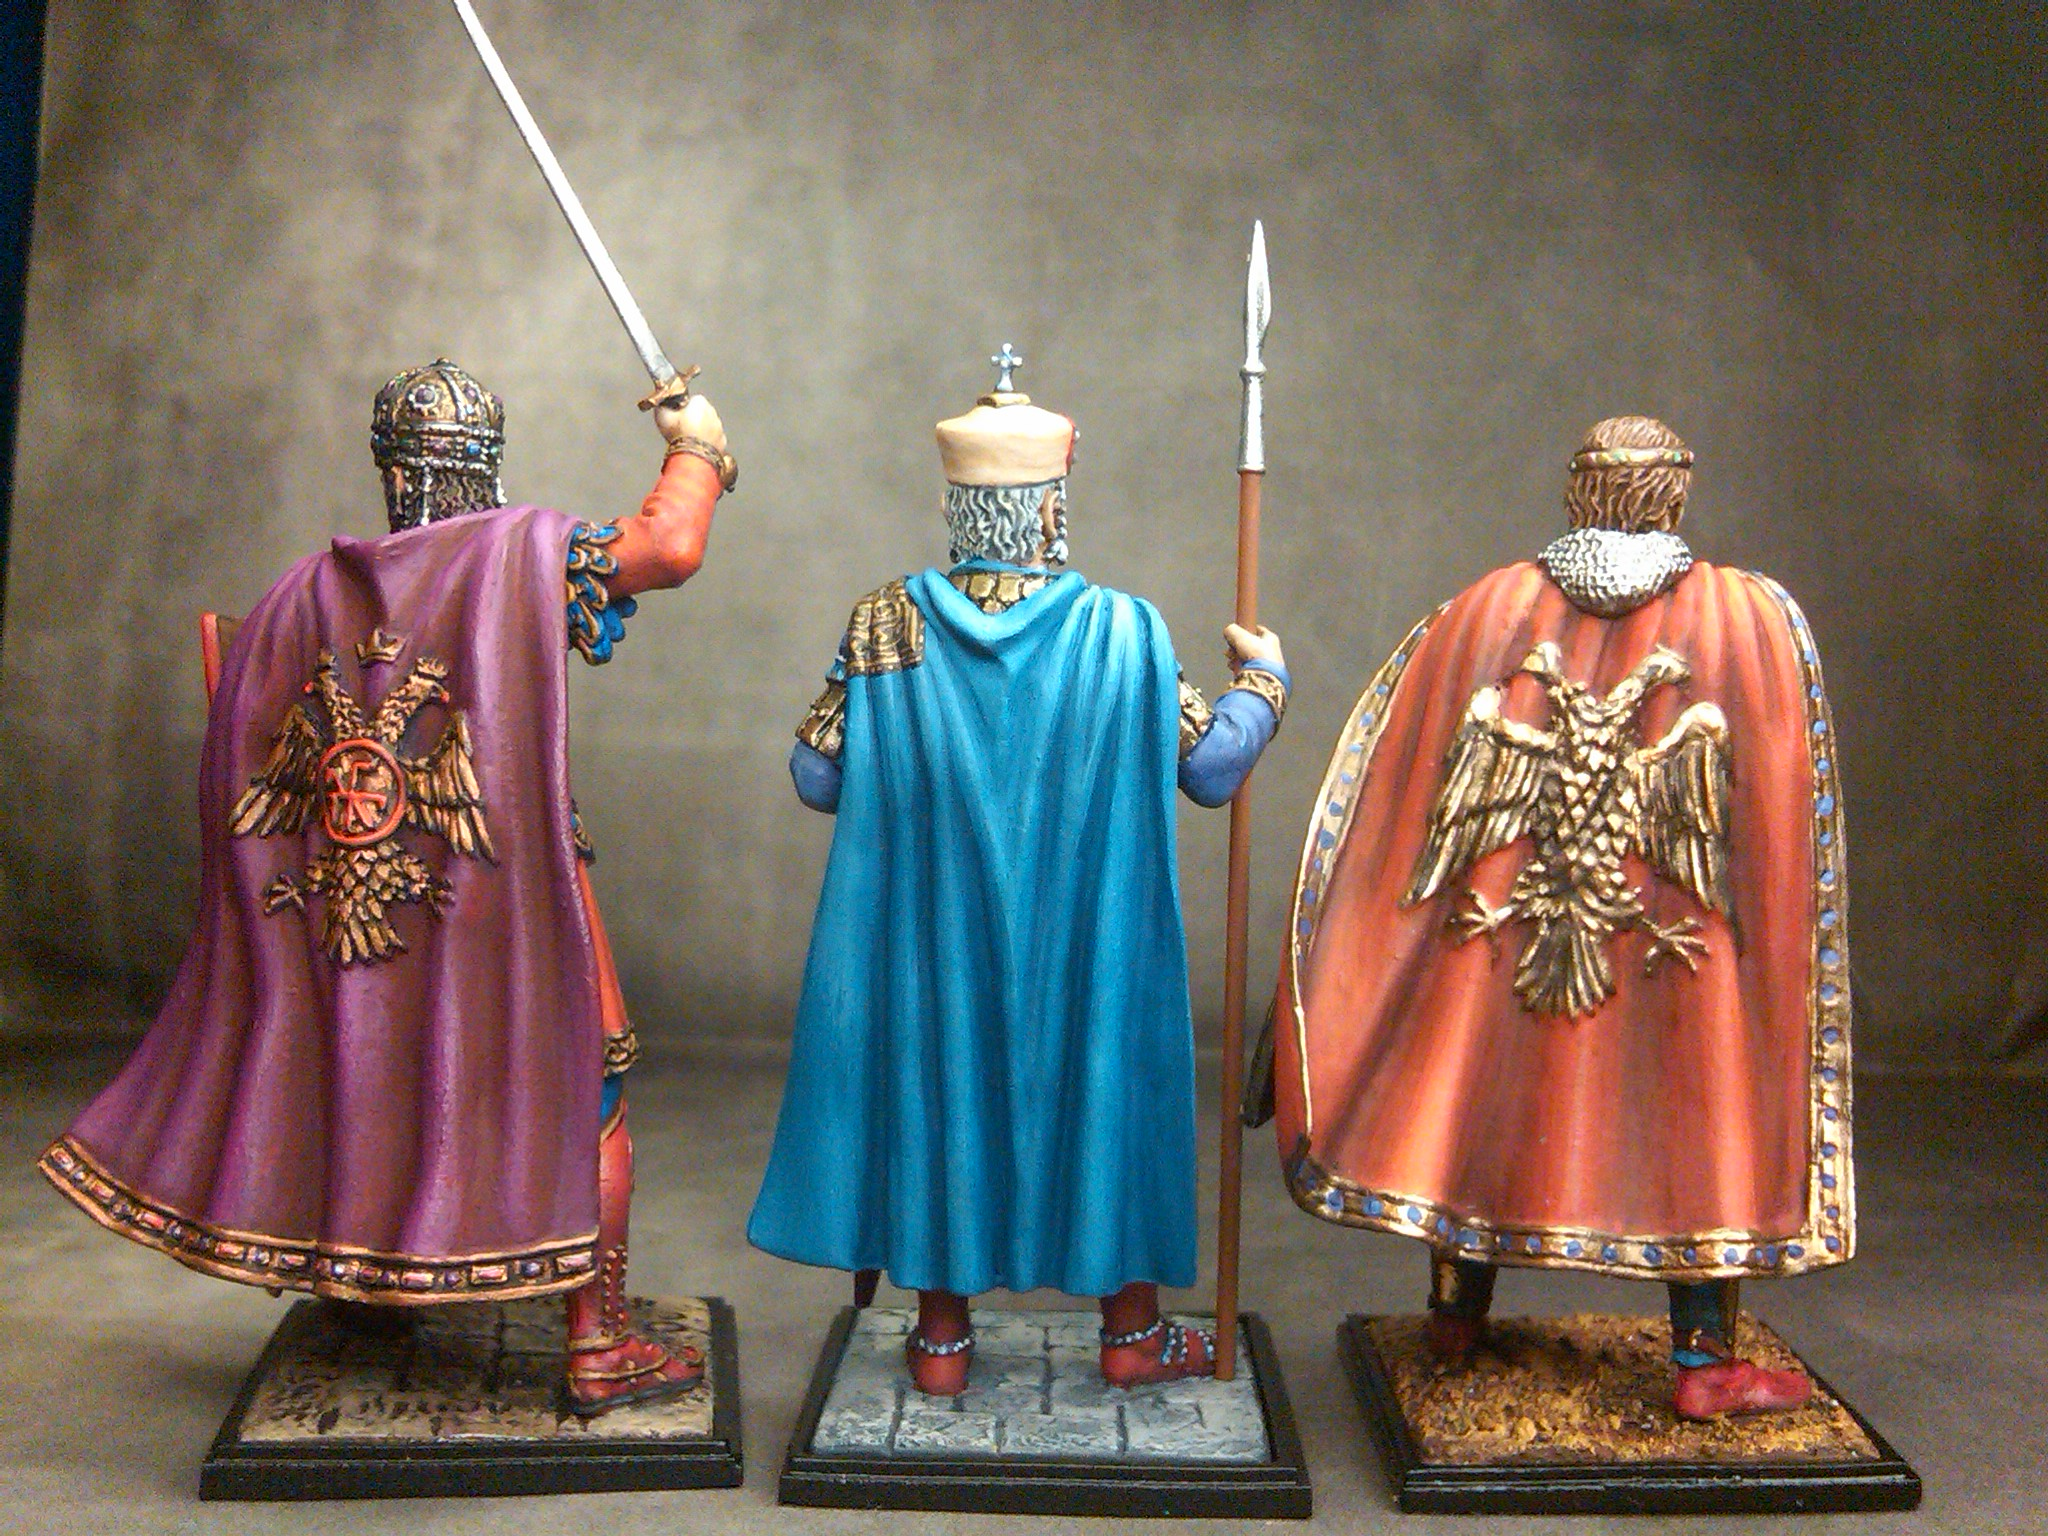 Byzantine emperor, byzantine army, byzantine soldier,,palaiologos, komnenos, basil II, βυζαντινος στρατος, Παλαιολογος, Κομνηνος, Βασιλειος ΙΙ,